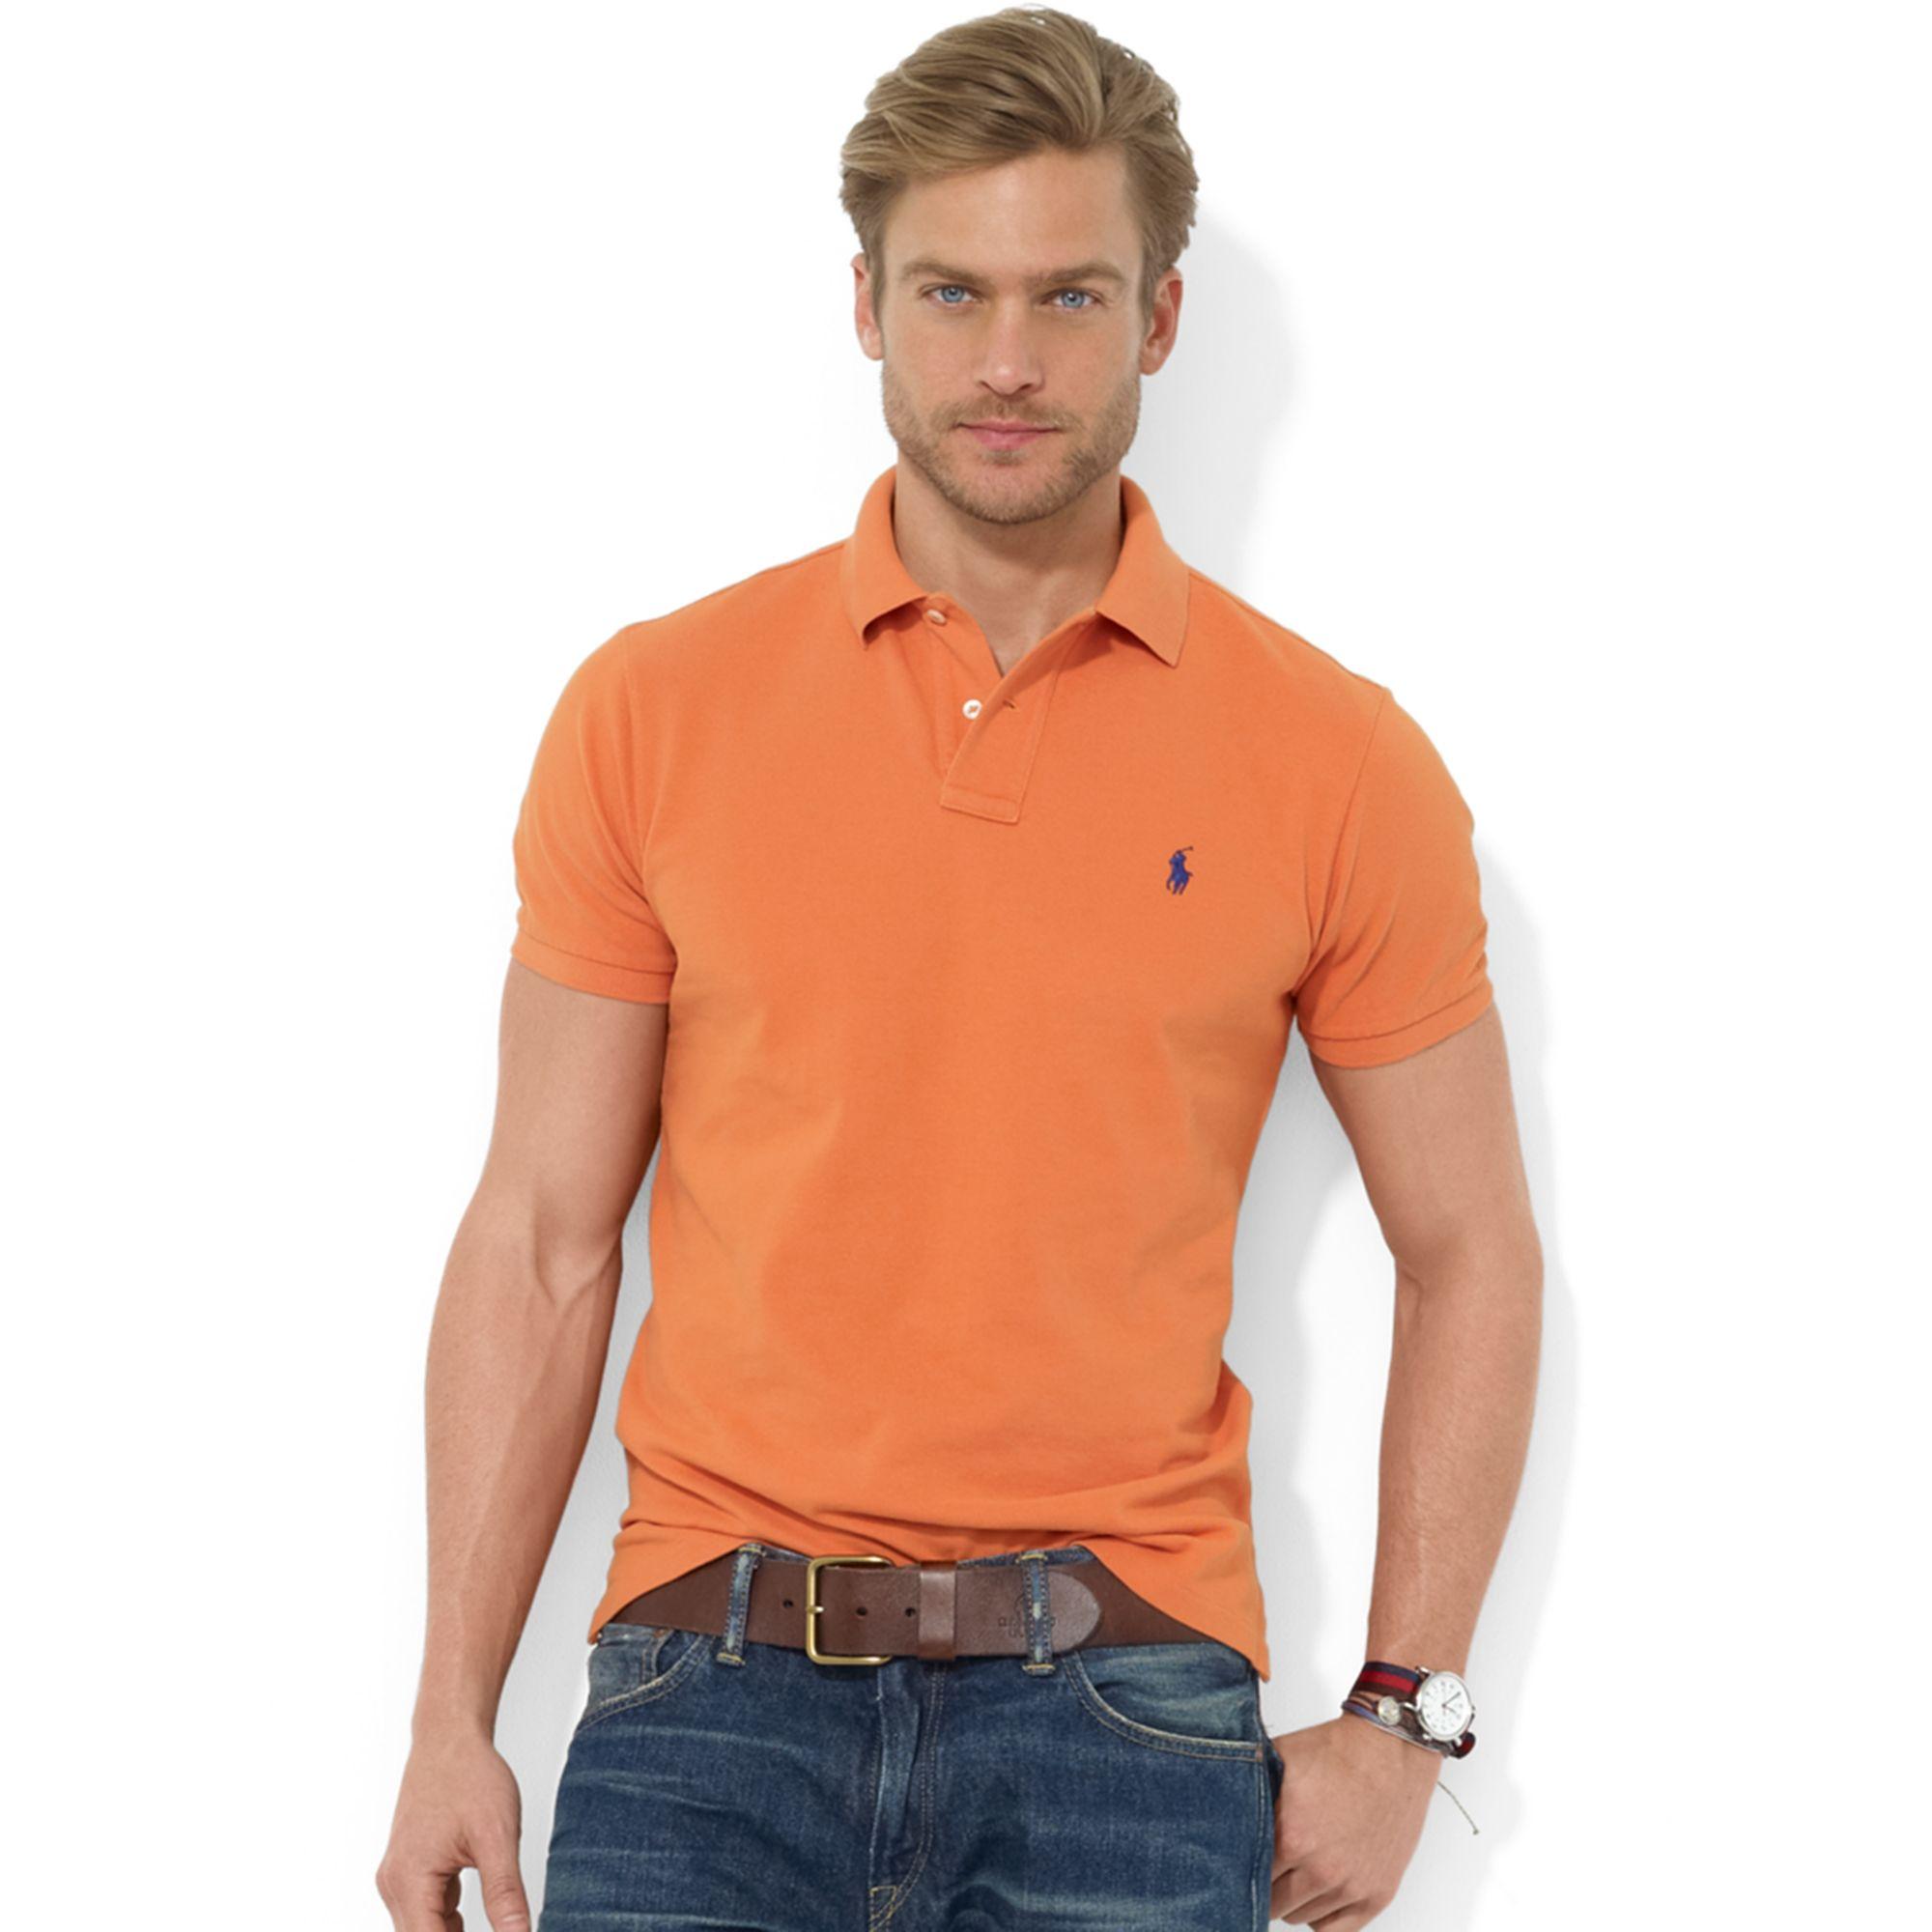 38951f70 ... shirt b5188 eee7f low price lyst ralph lauren customfit shortsleeve  cotton mesh polo in orange e6570 d4272 ...